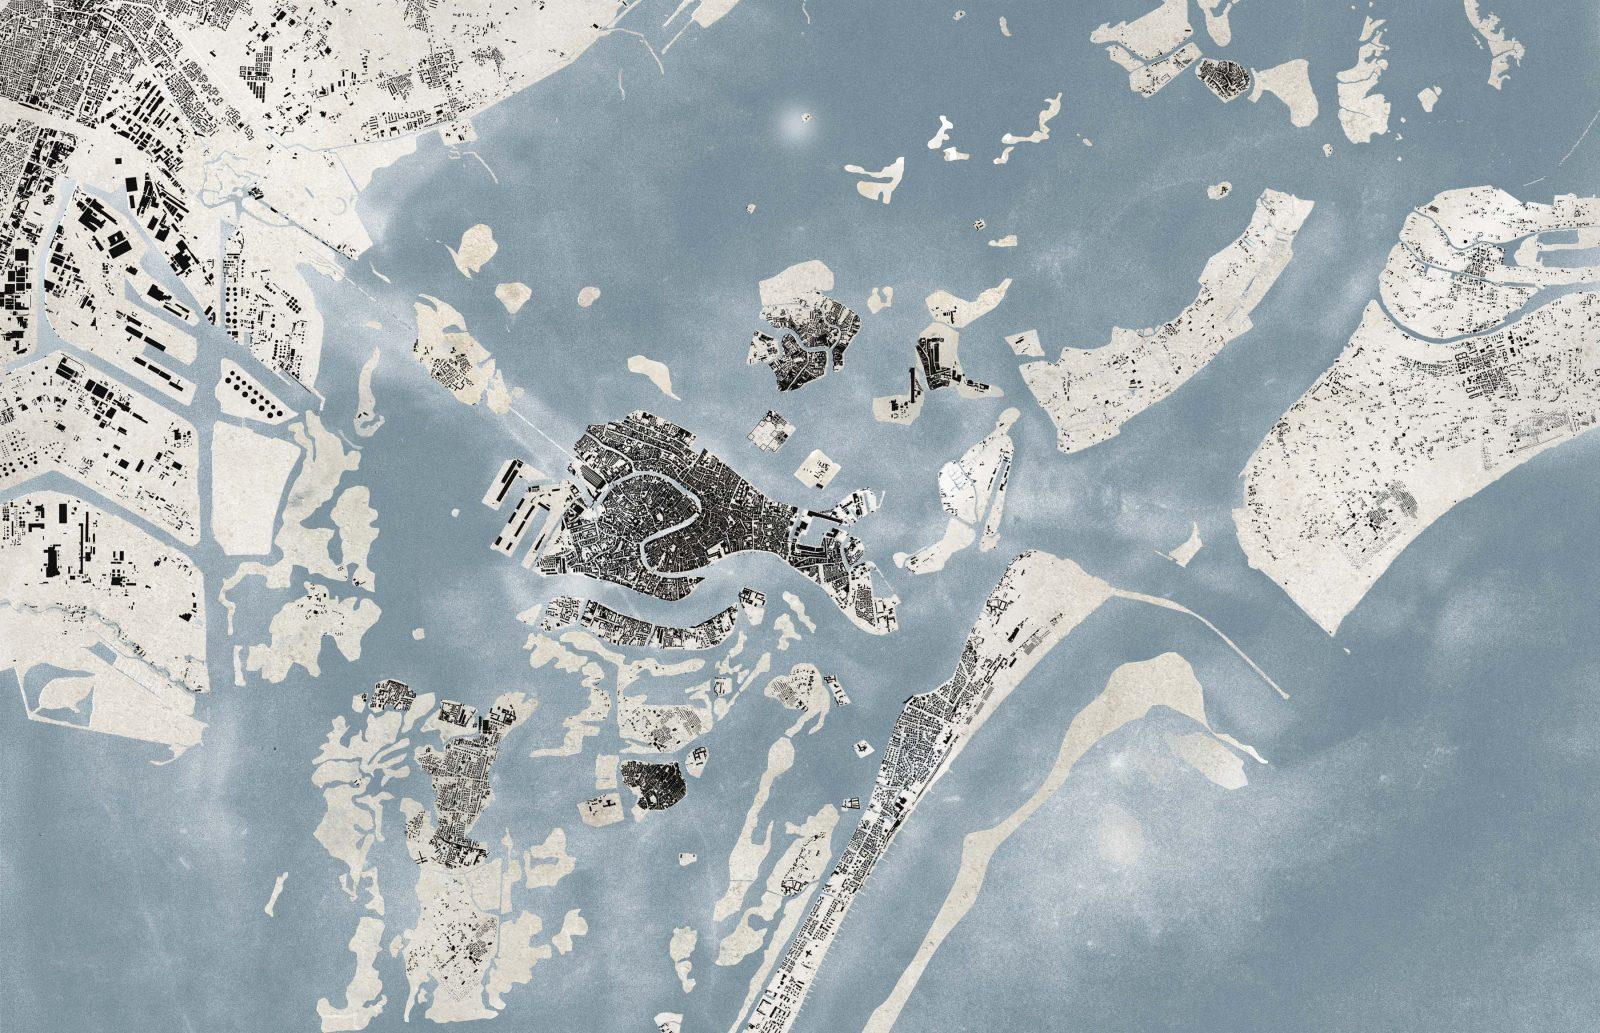 KjellanderSjober The Forests of Venice  map